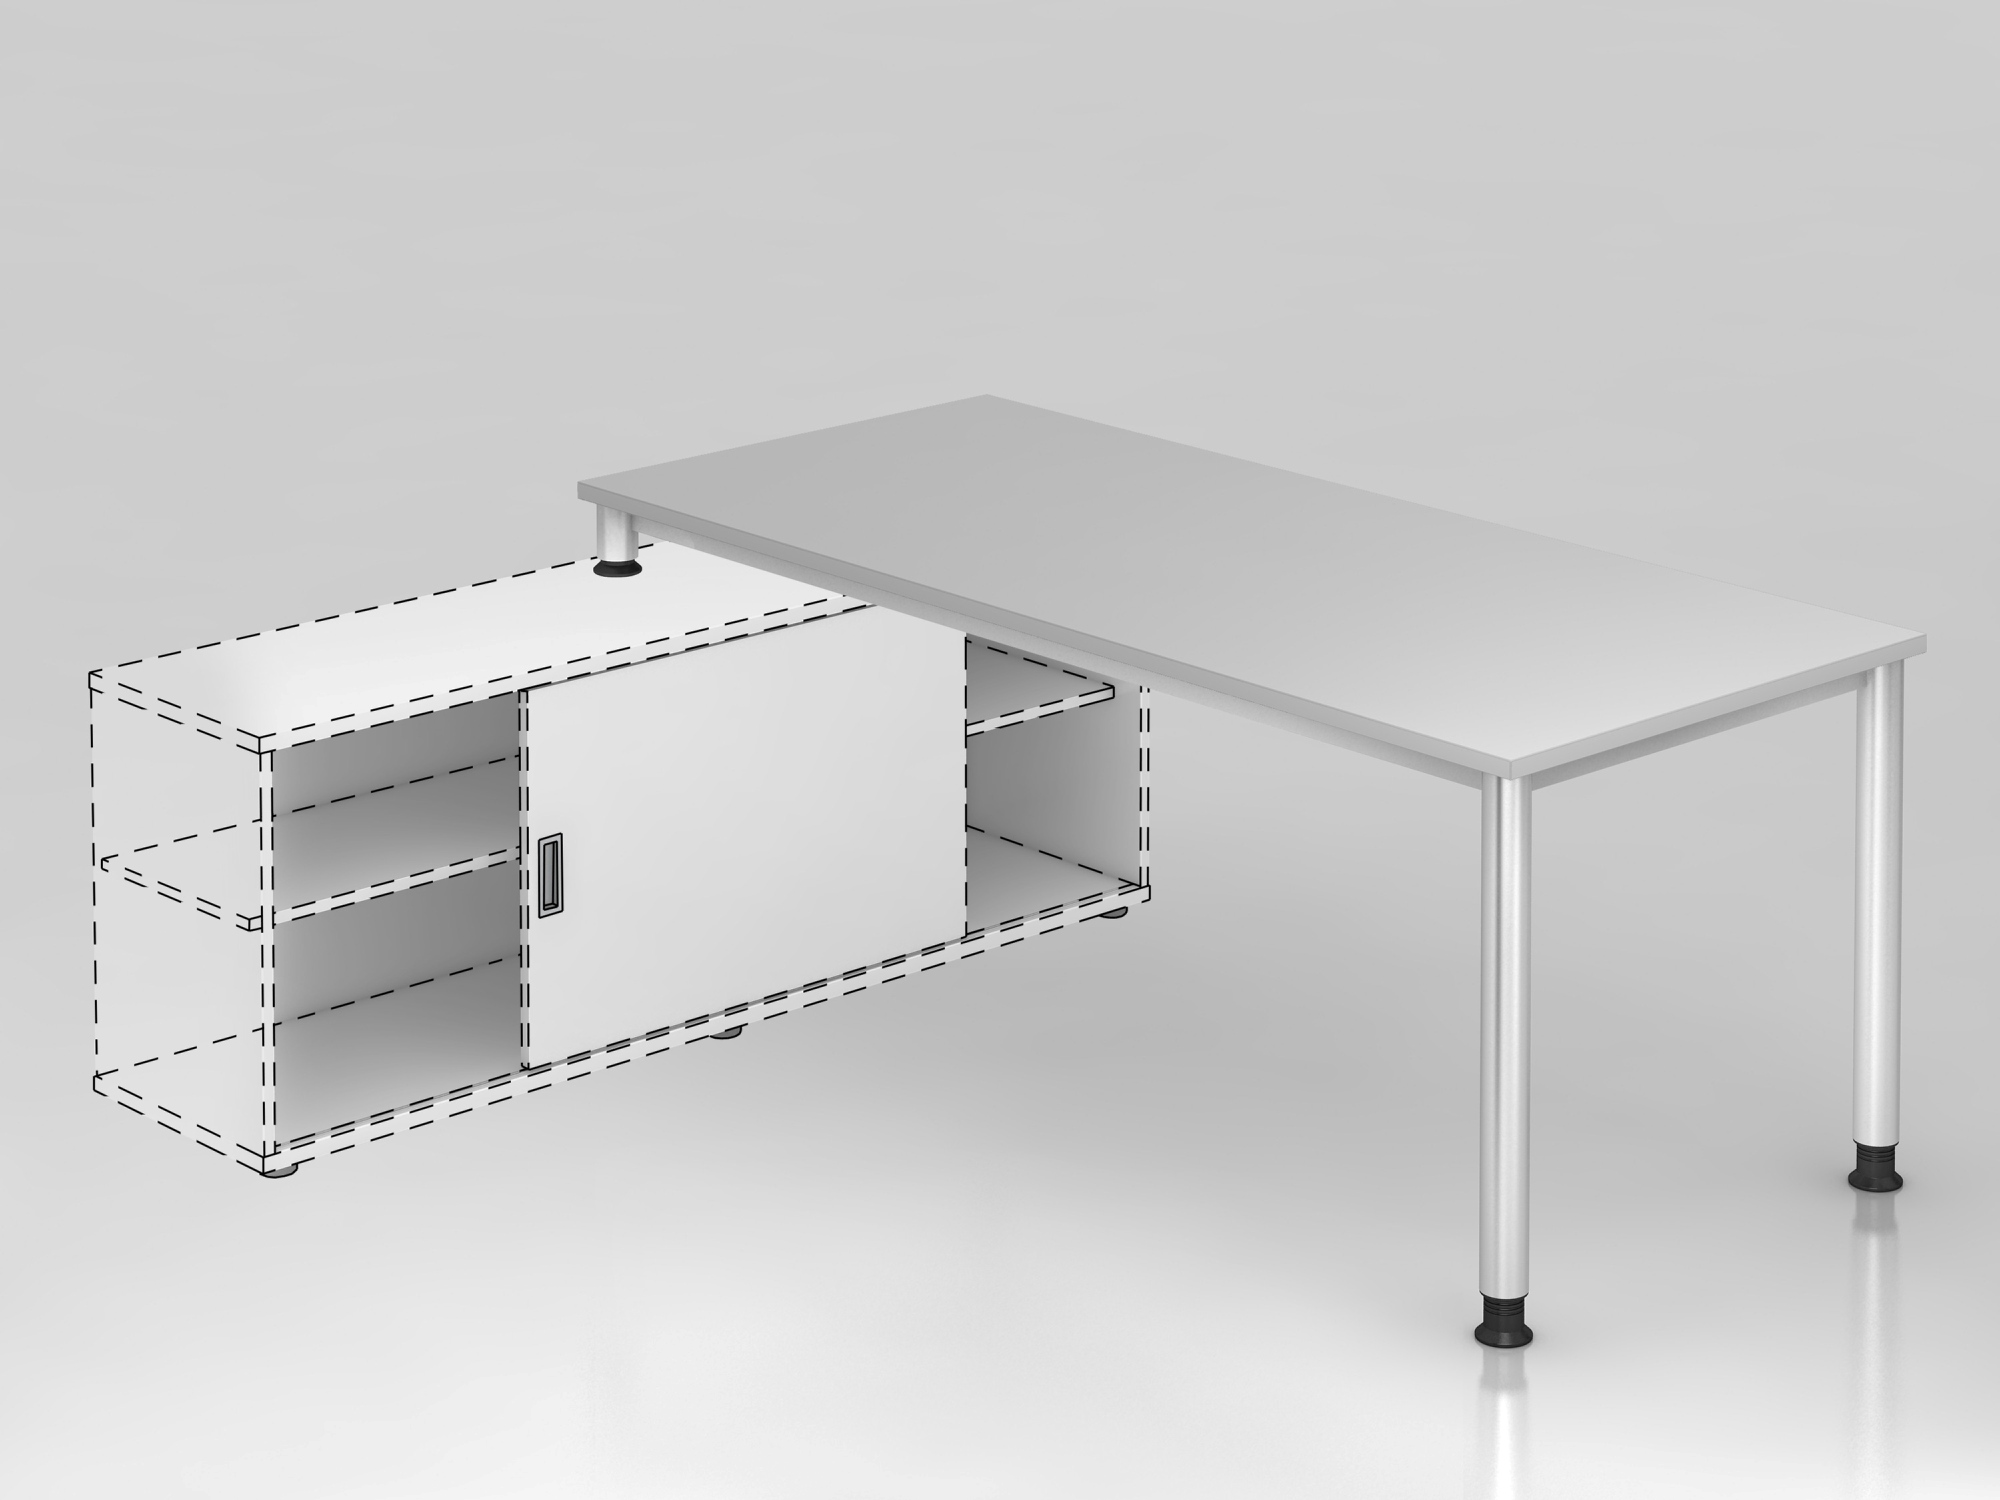 Anbauschreibtisch 4Fuß-rd.180x80cm Grau/S